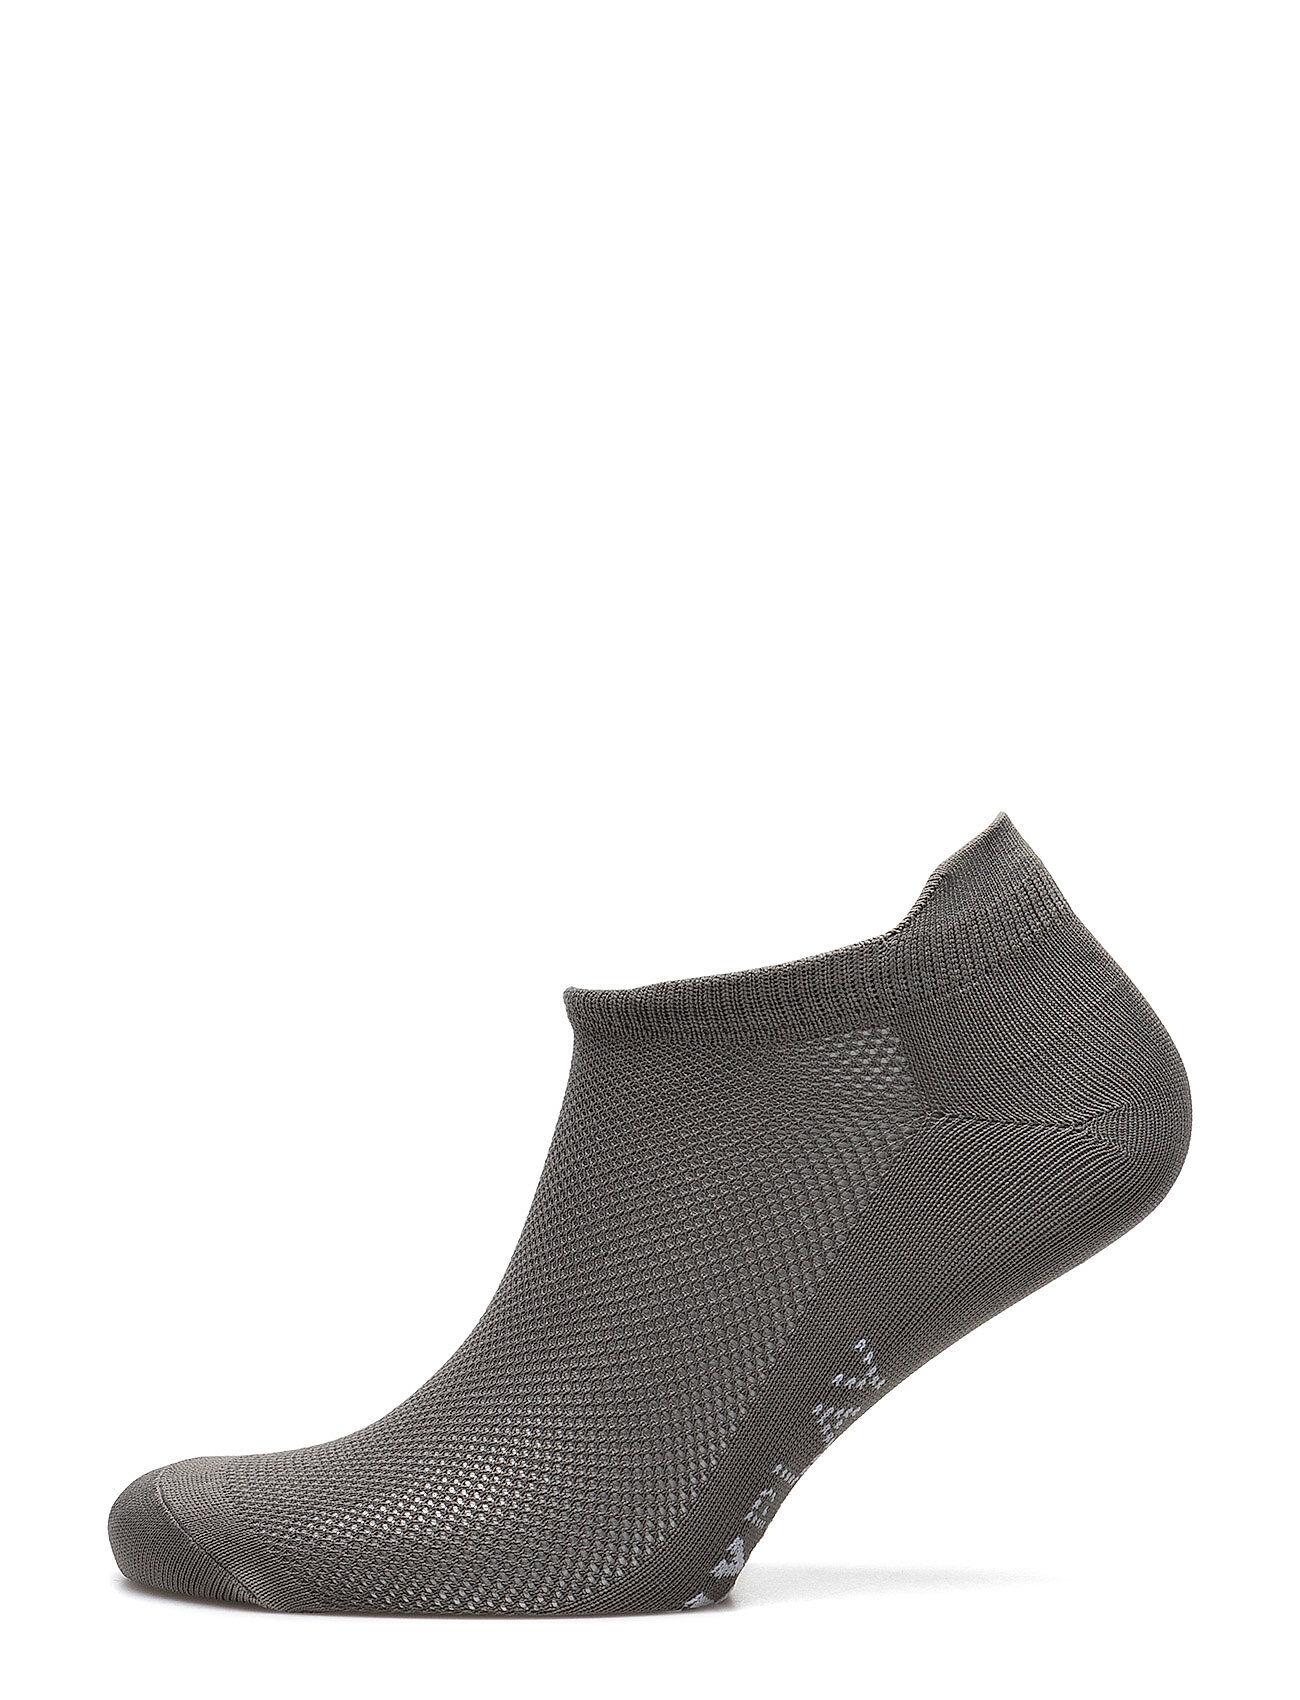 Image of ONLY PLAY Onptraining Socks - Opus Nilkkasukat Lyhytvartiset Sukat Harmaa ONLY PLAY